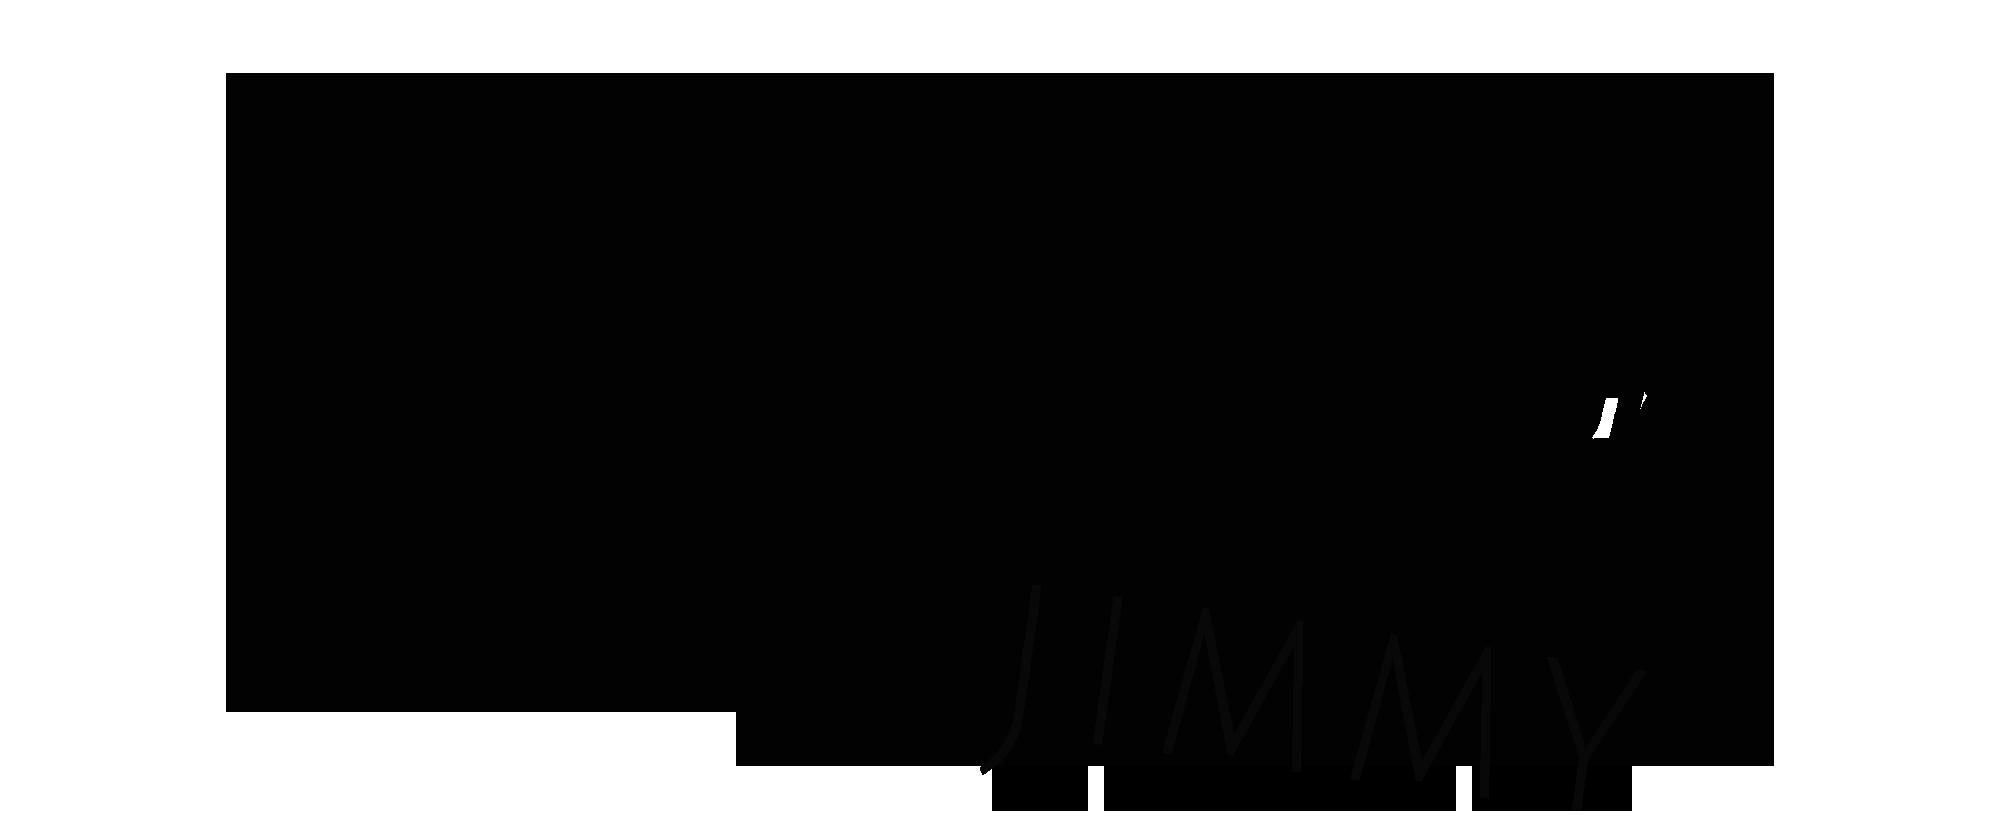 Colingwood blue jays logo